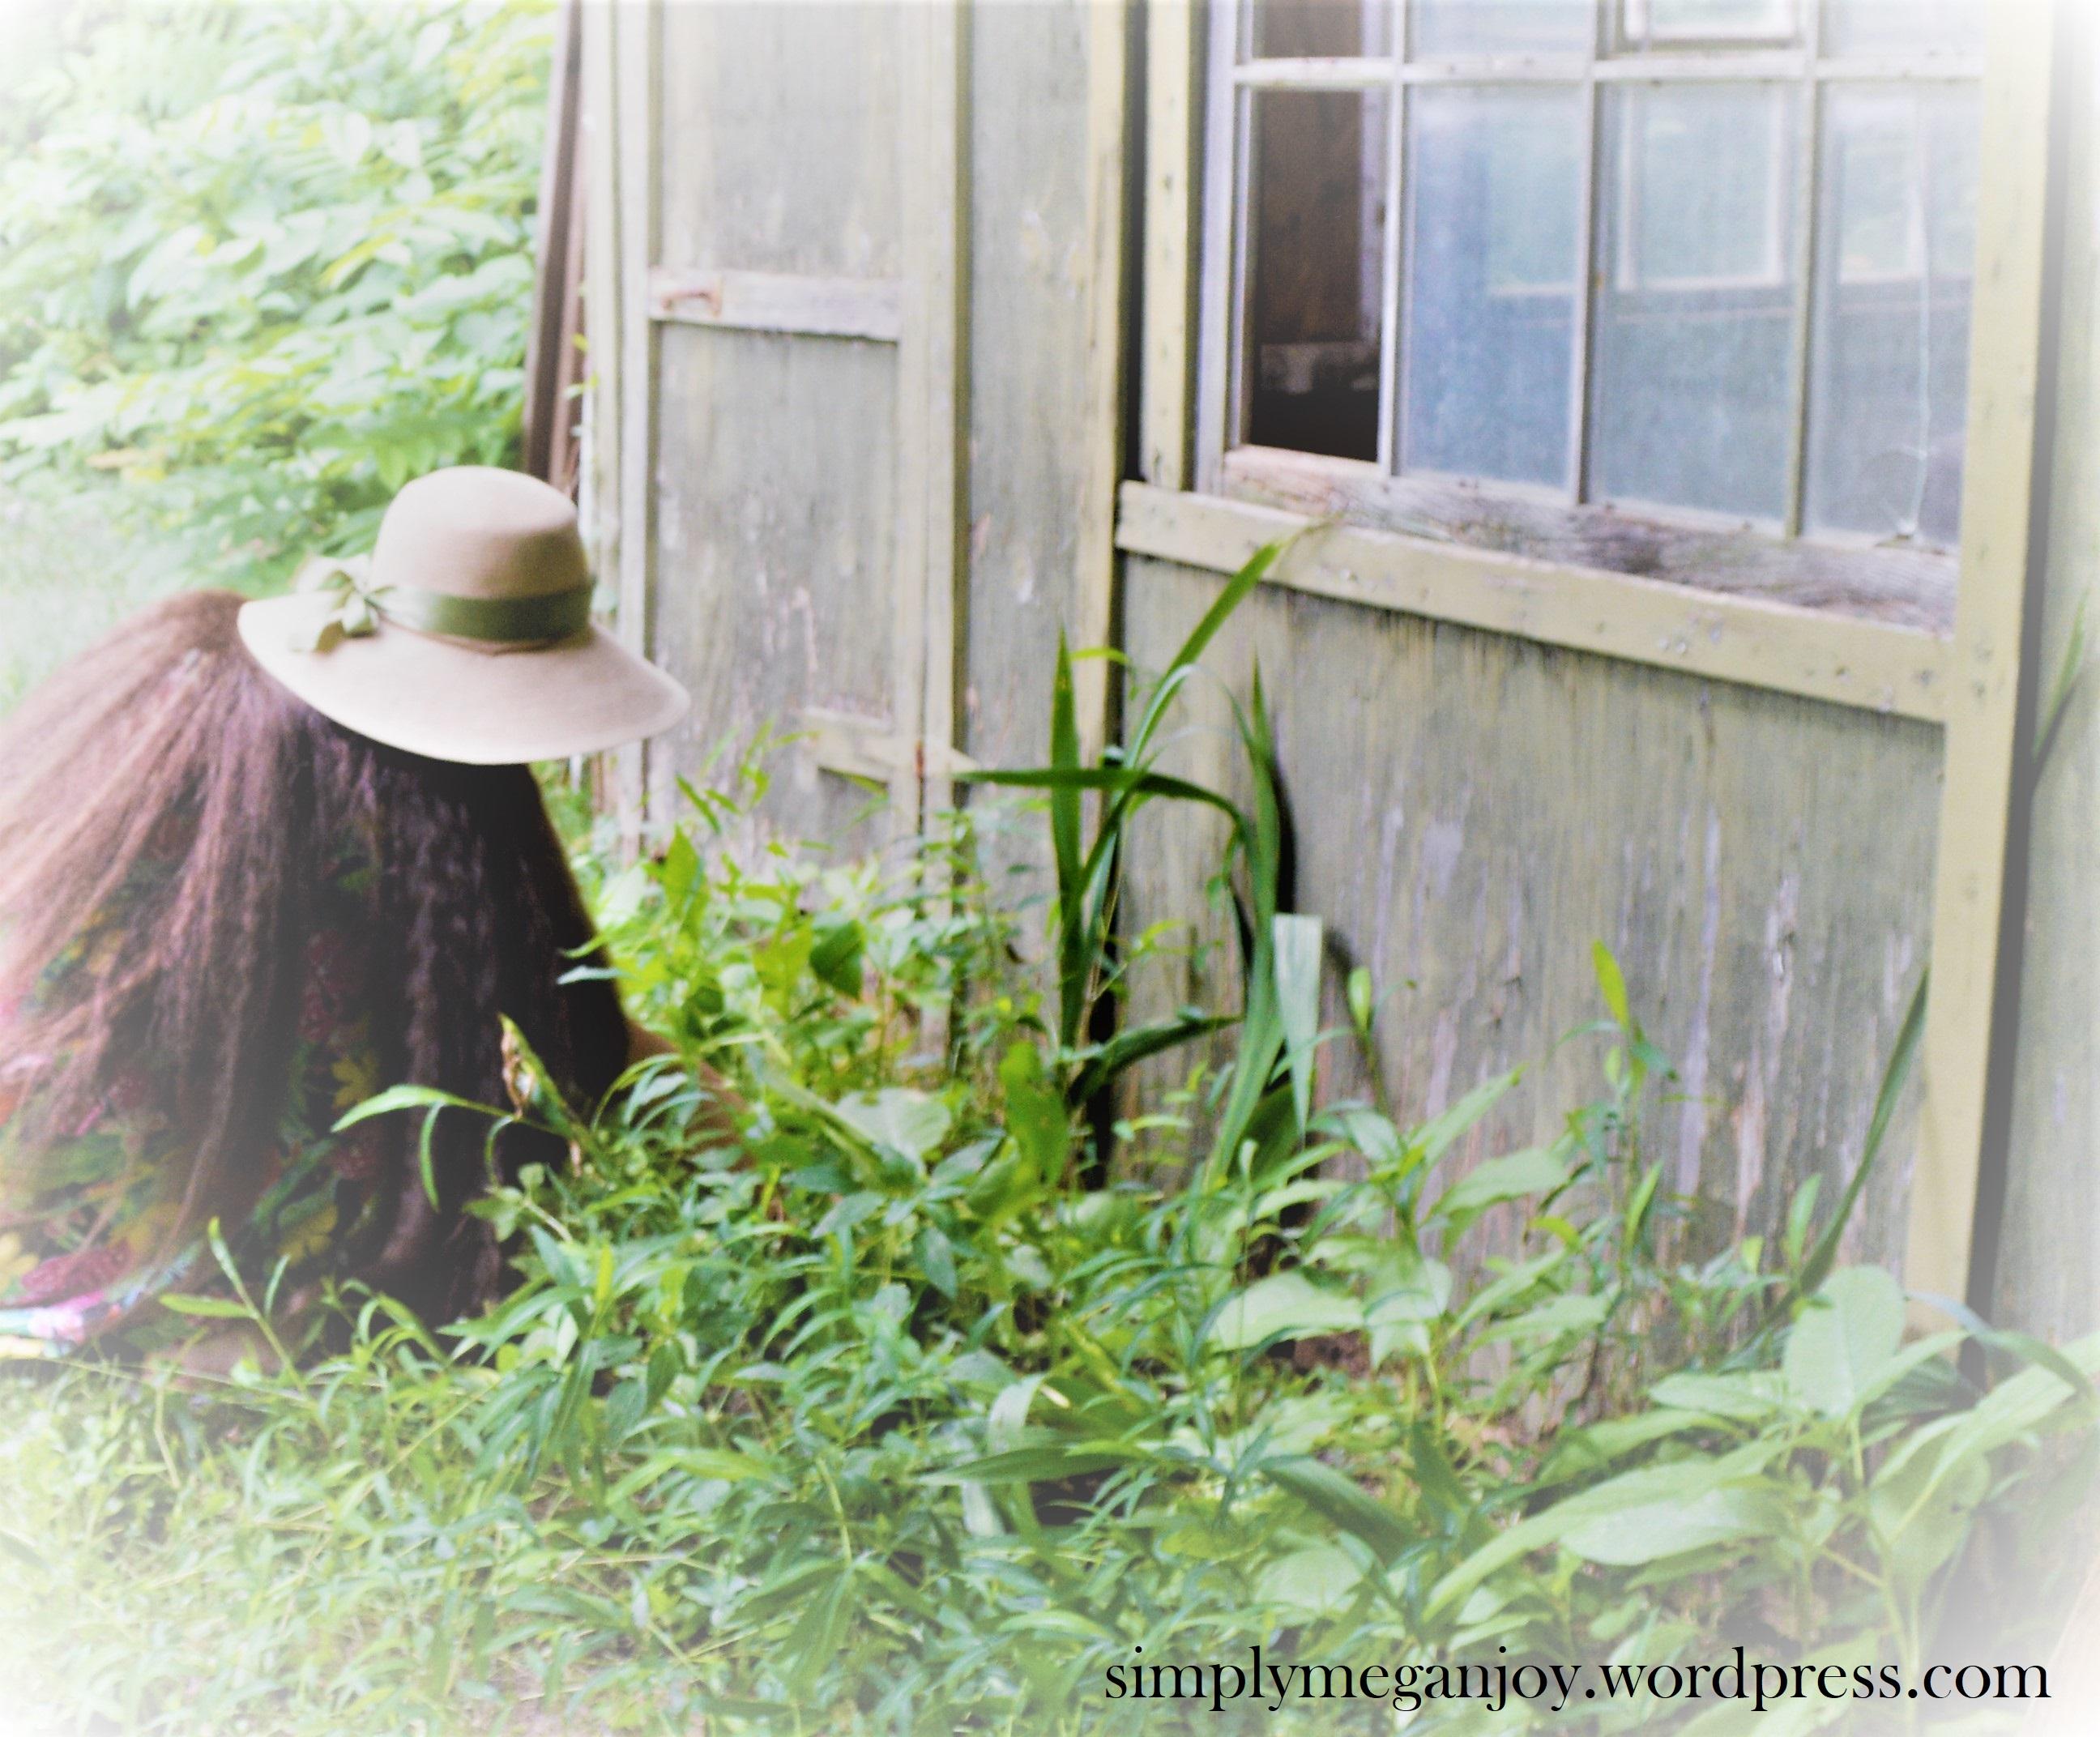 SIY (Sew It Yourself) - Gardening Dress simplymeganjoy.wordpress.com 3